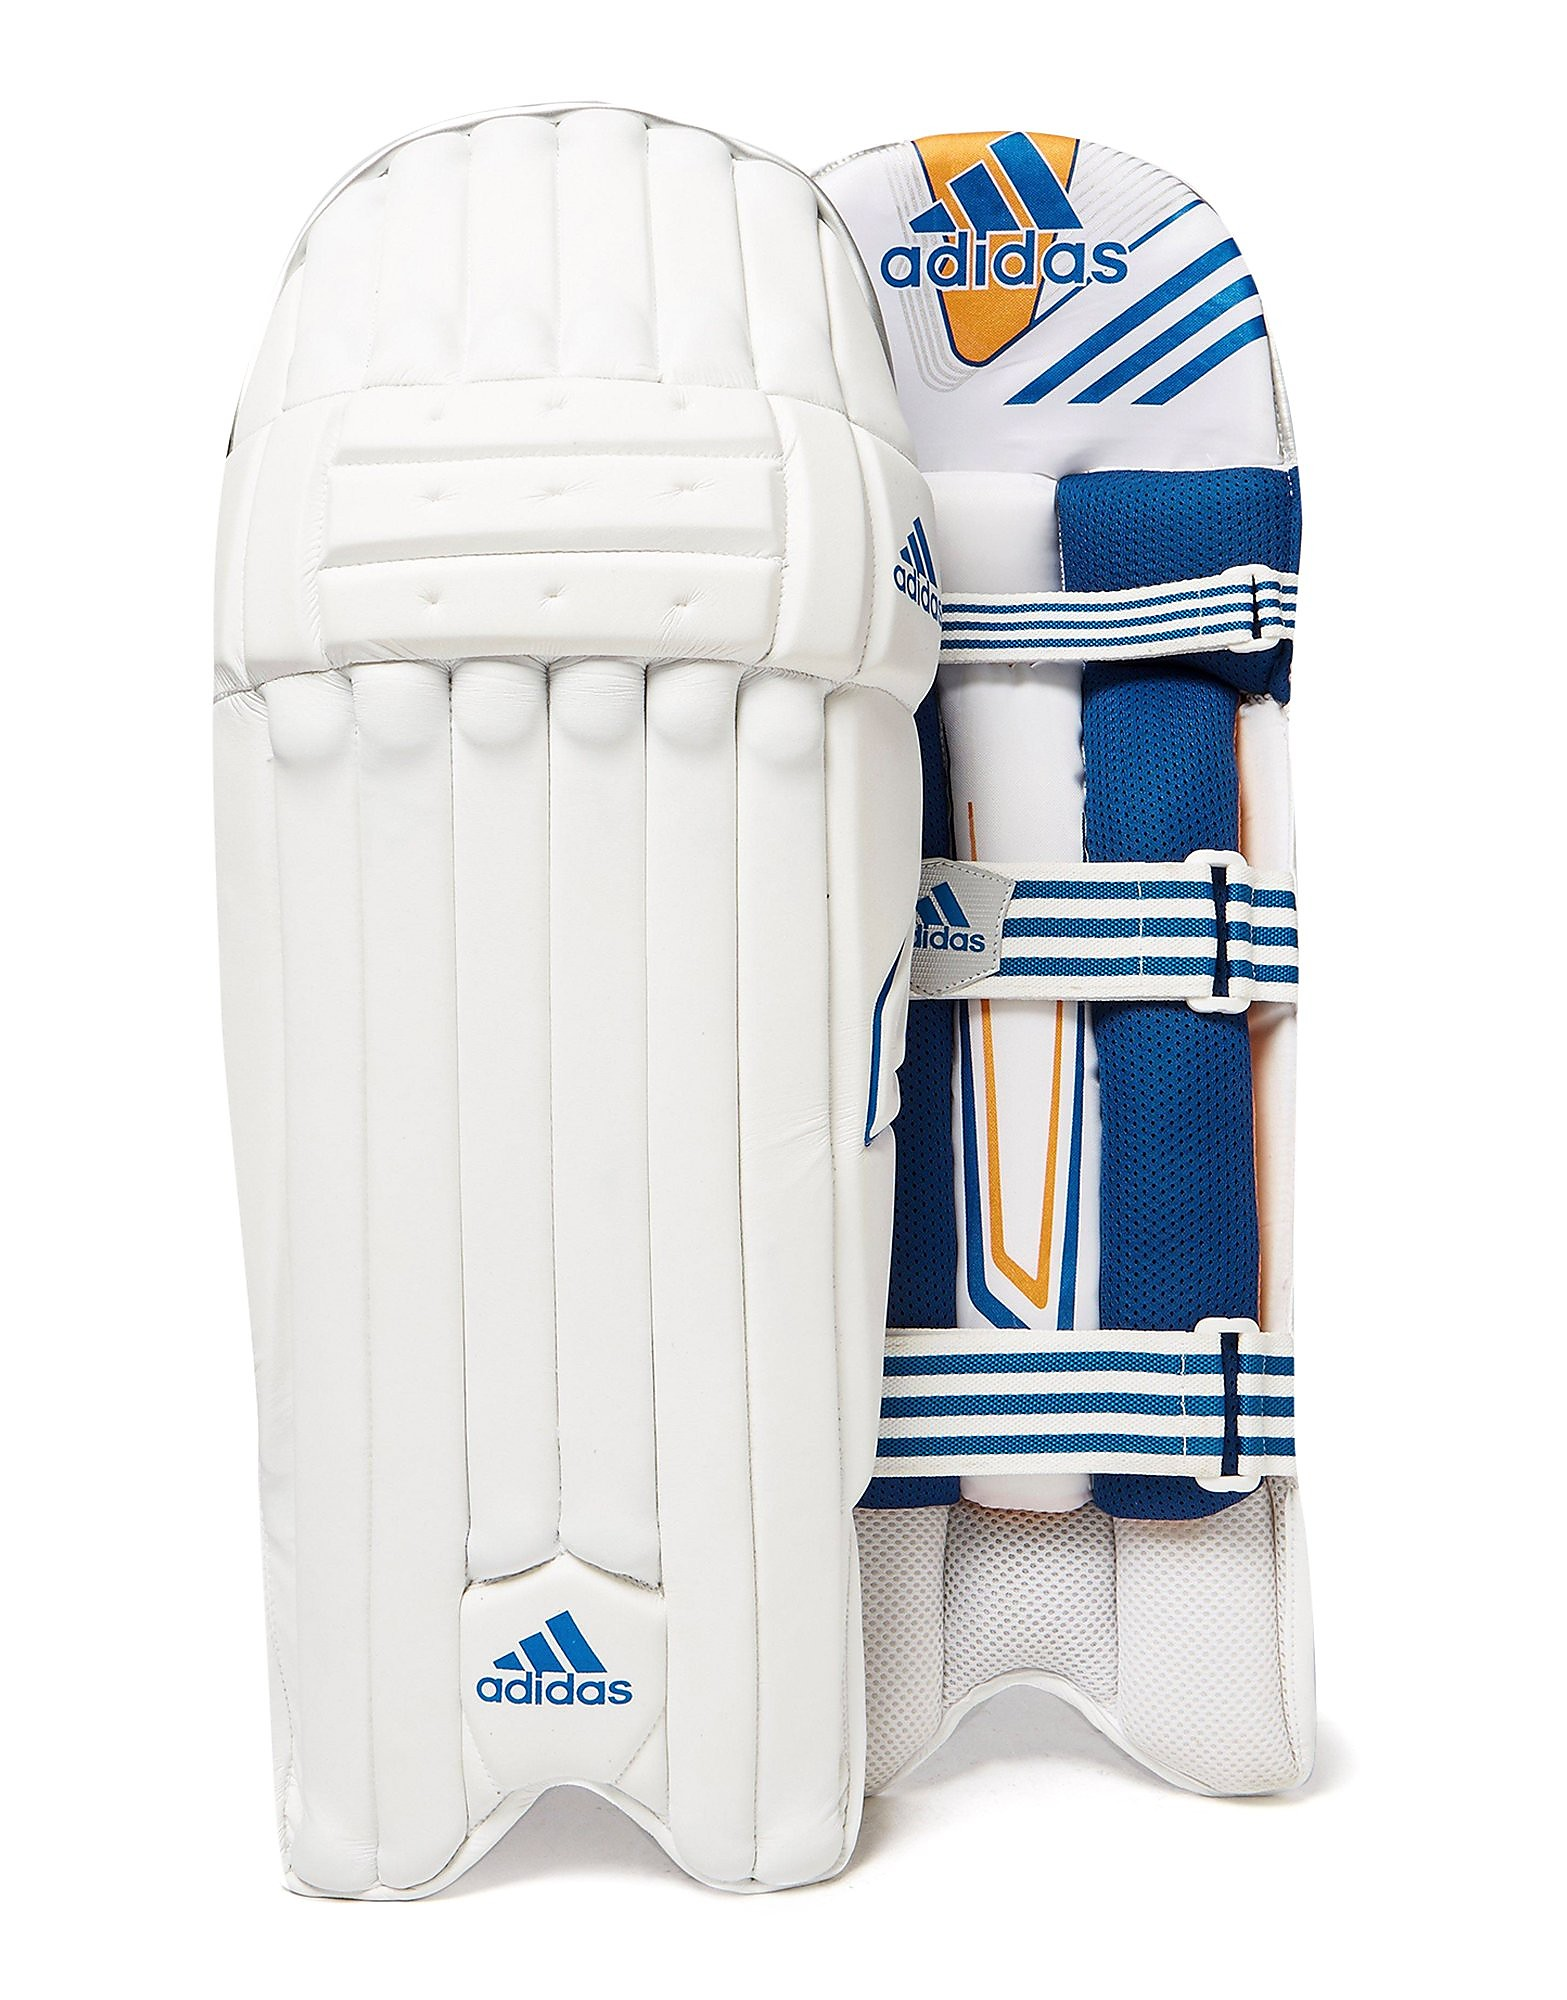 adidas CX11 Cricket Batting Pad